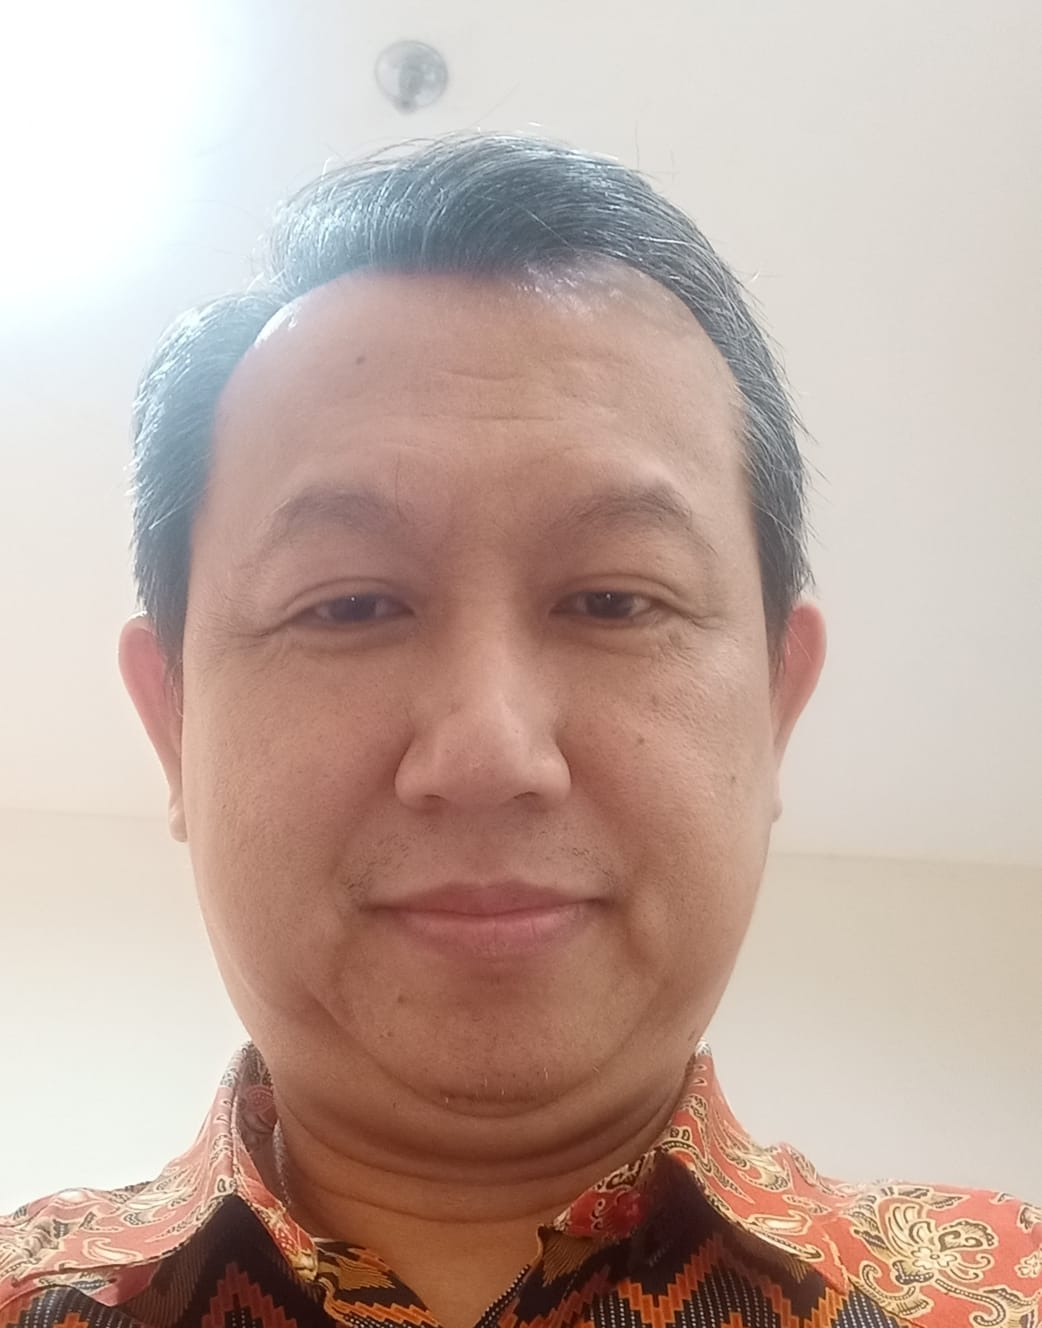 Ali Wijoyo